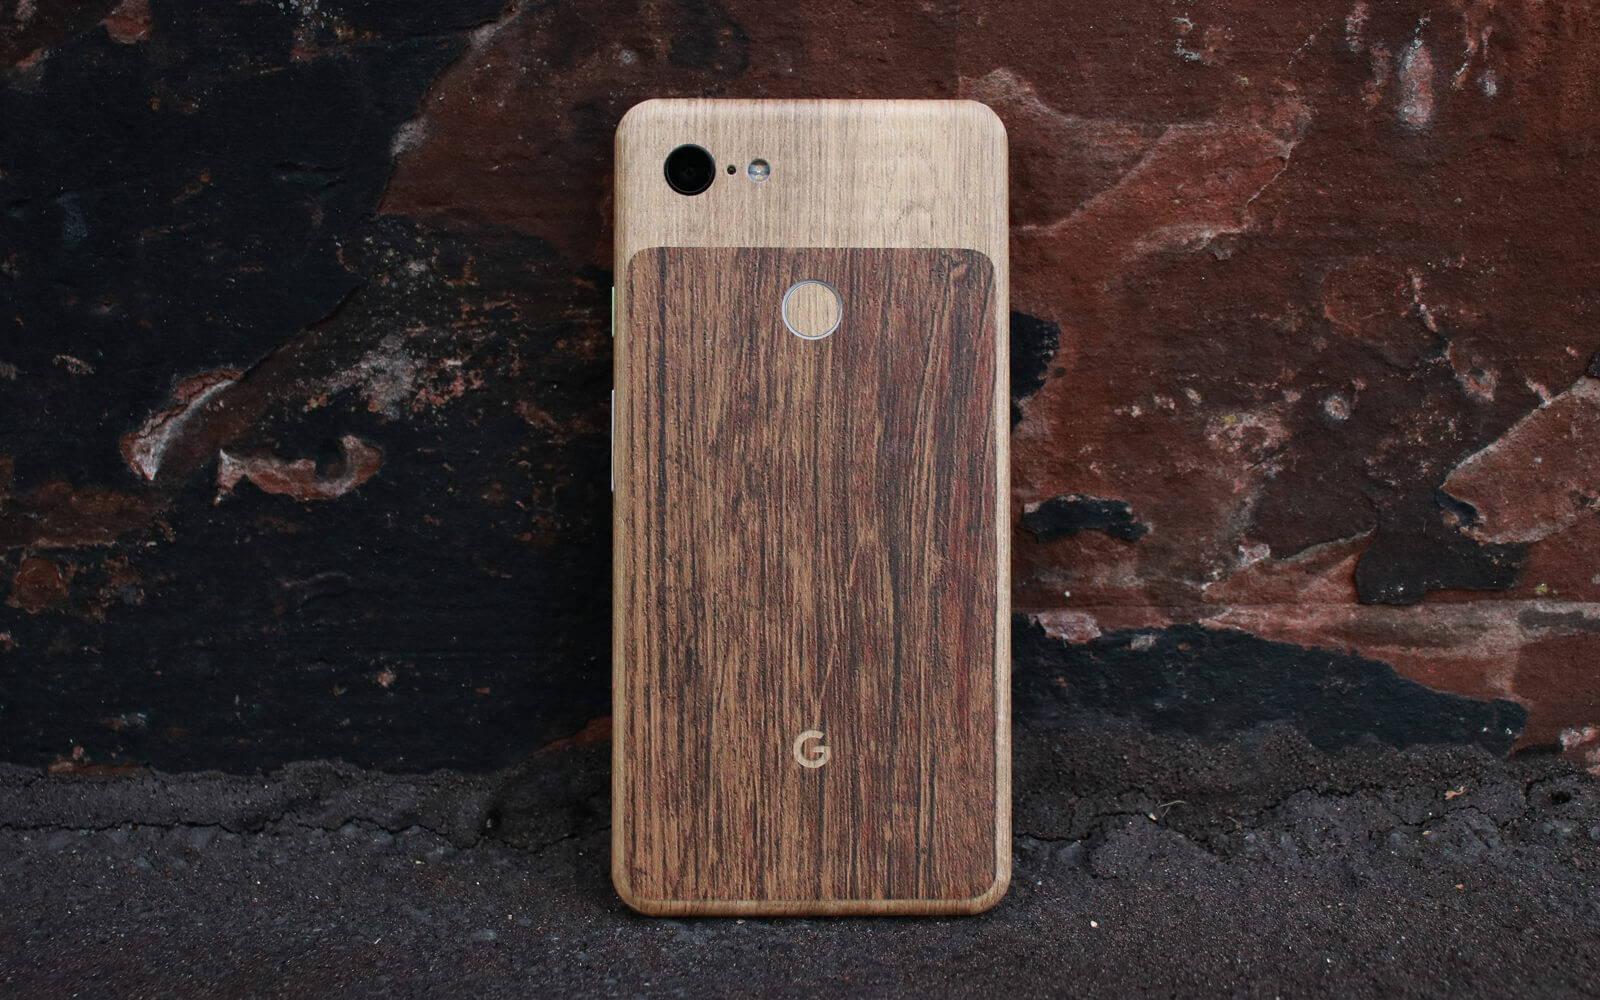 Google Pixel 3 Modern Oak and Aged Oak Skins